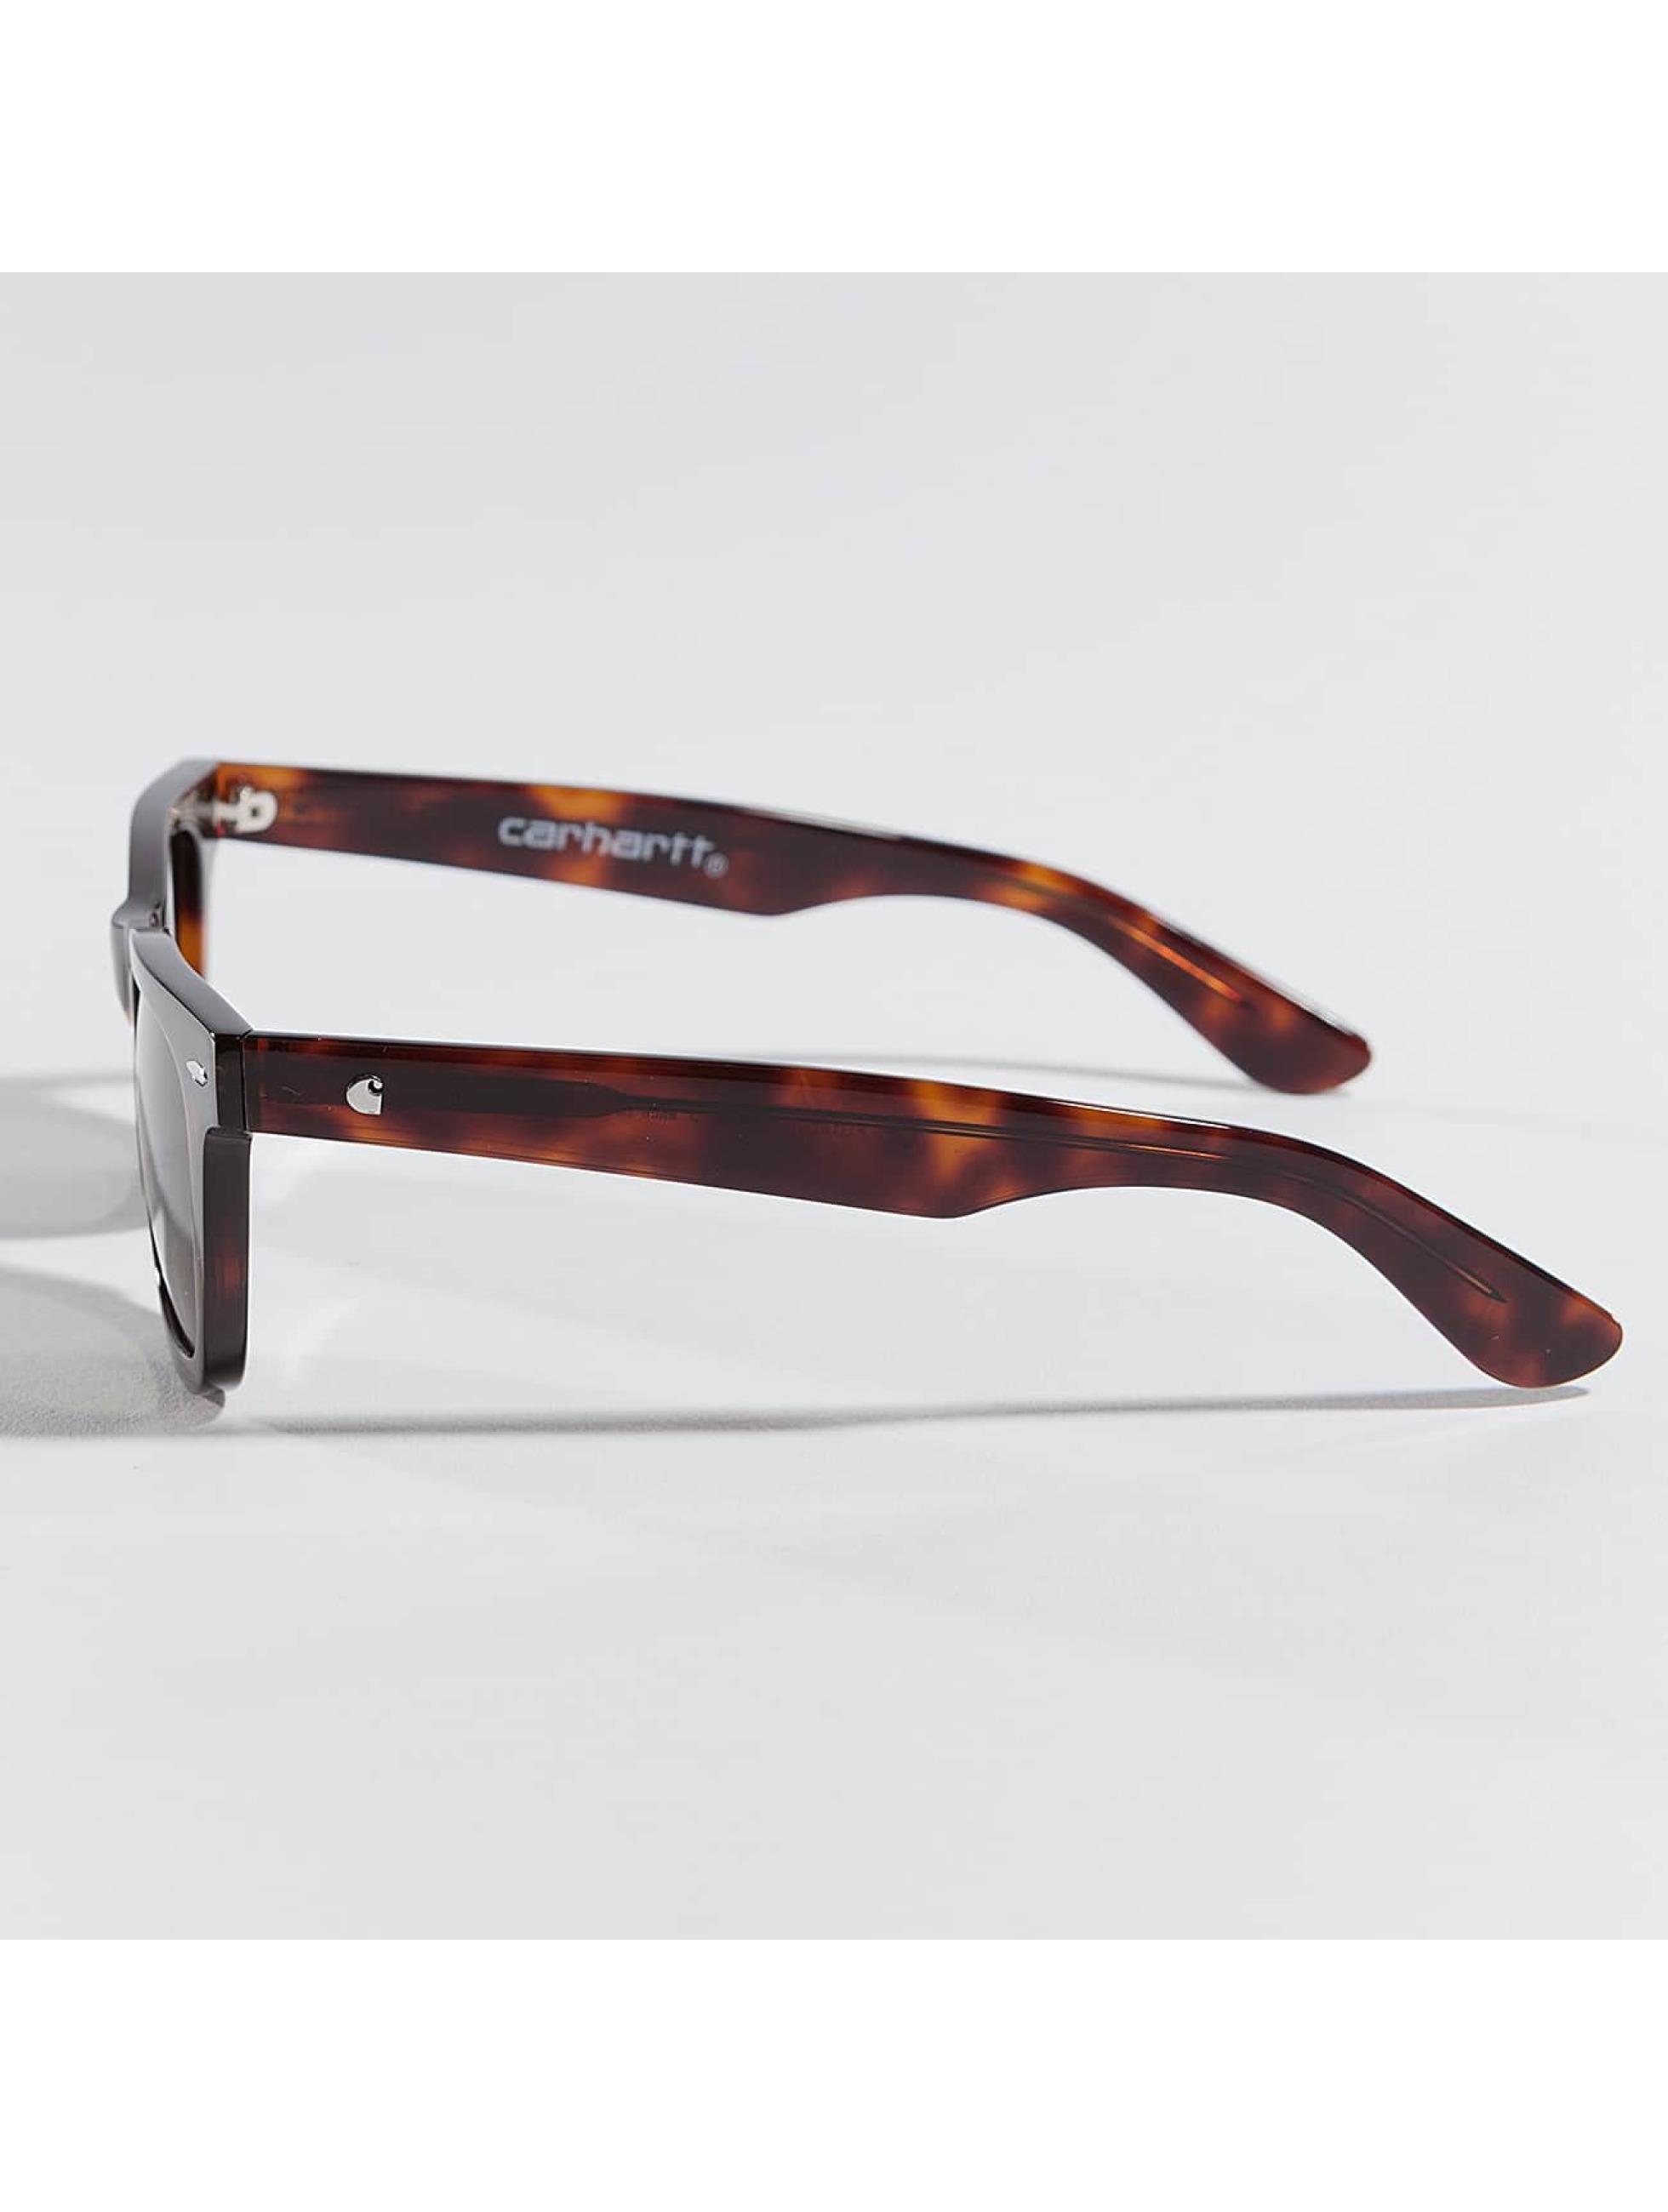 Carhartt WIP Sunglasses Fanton brown